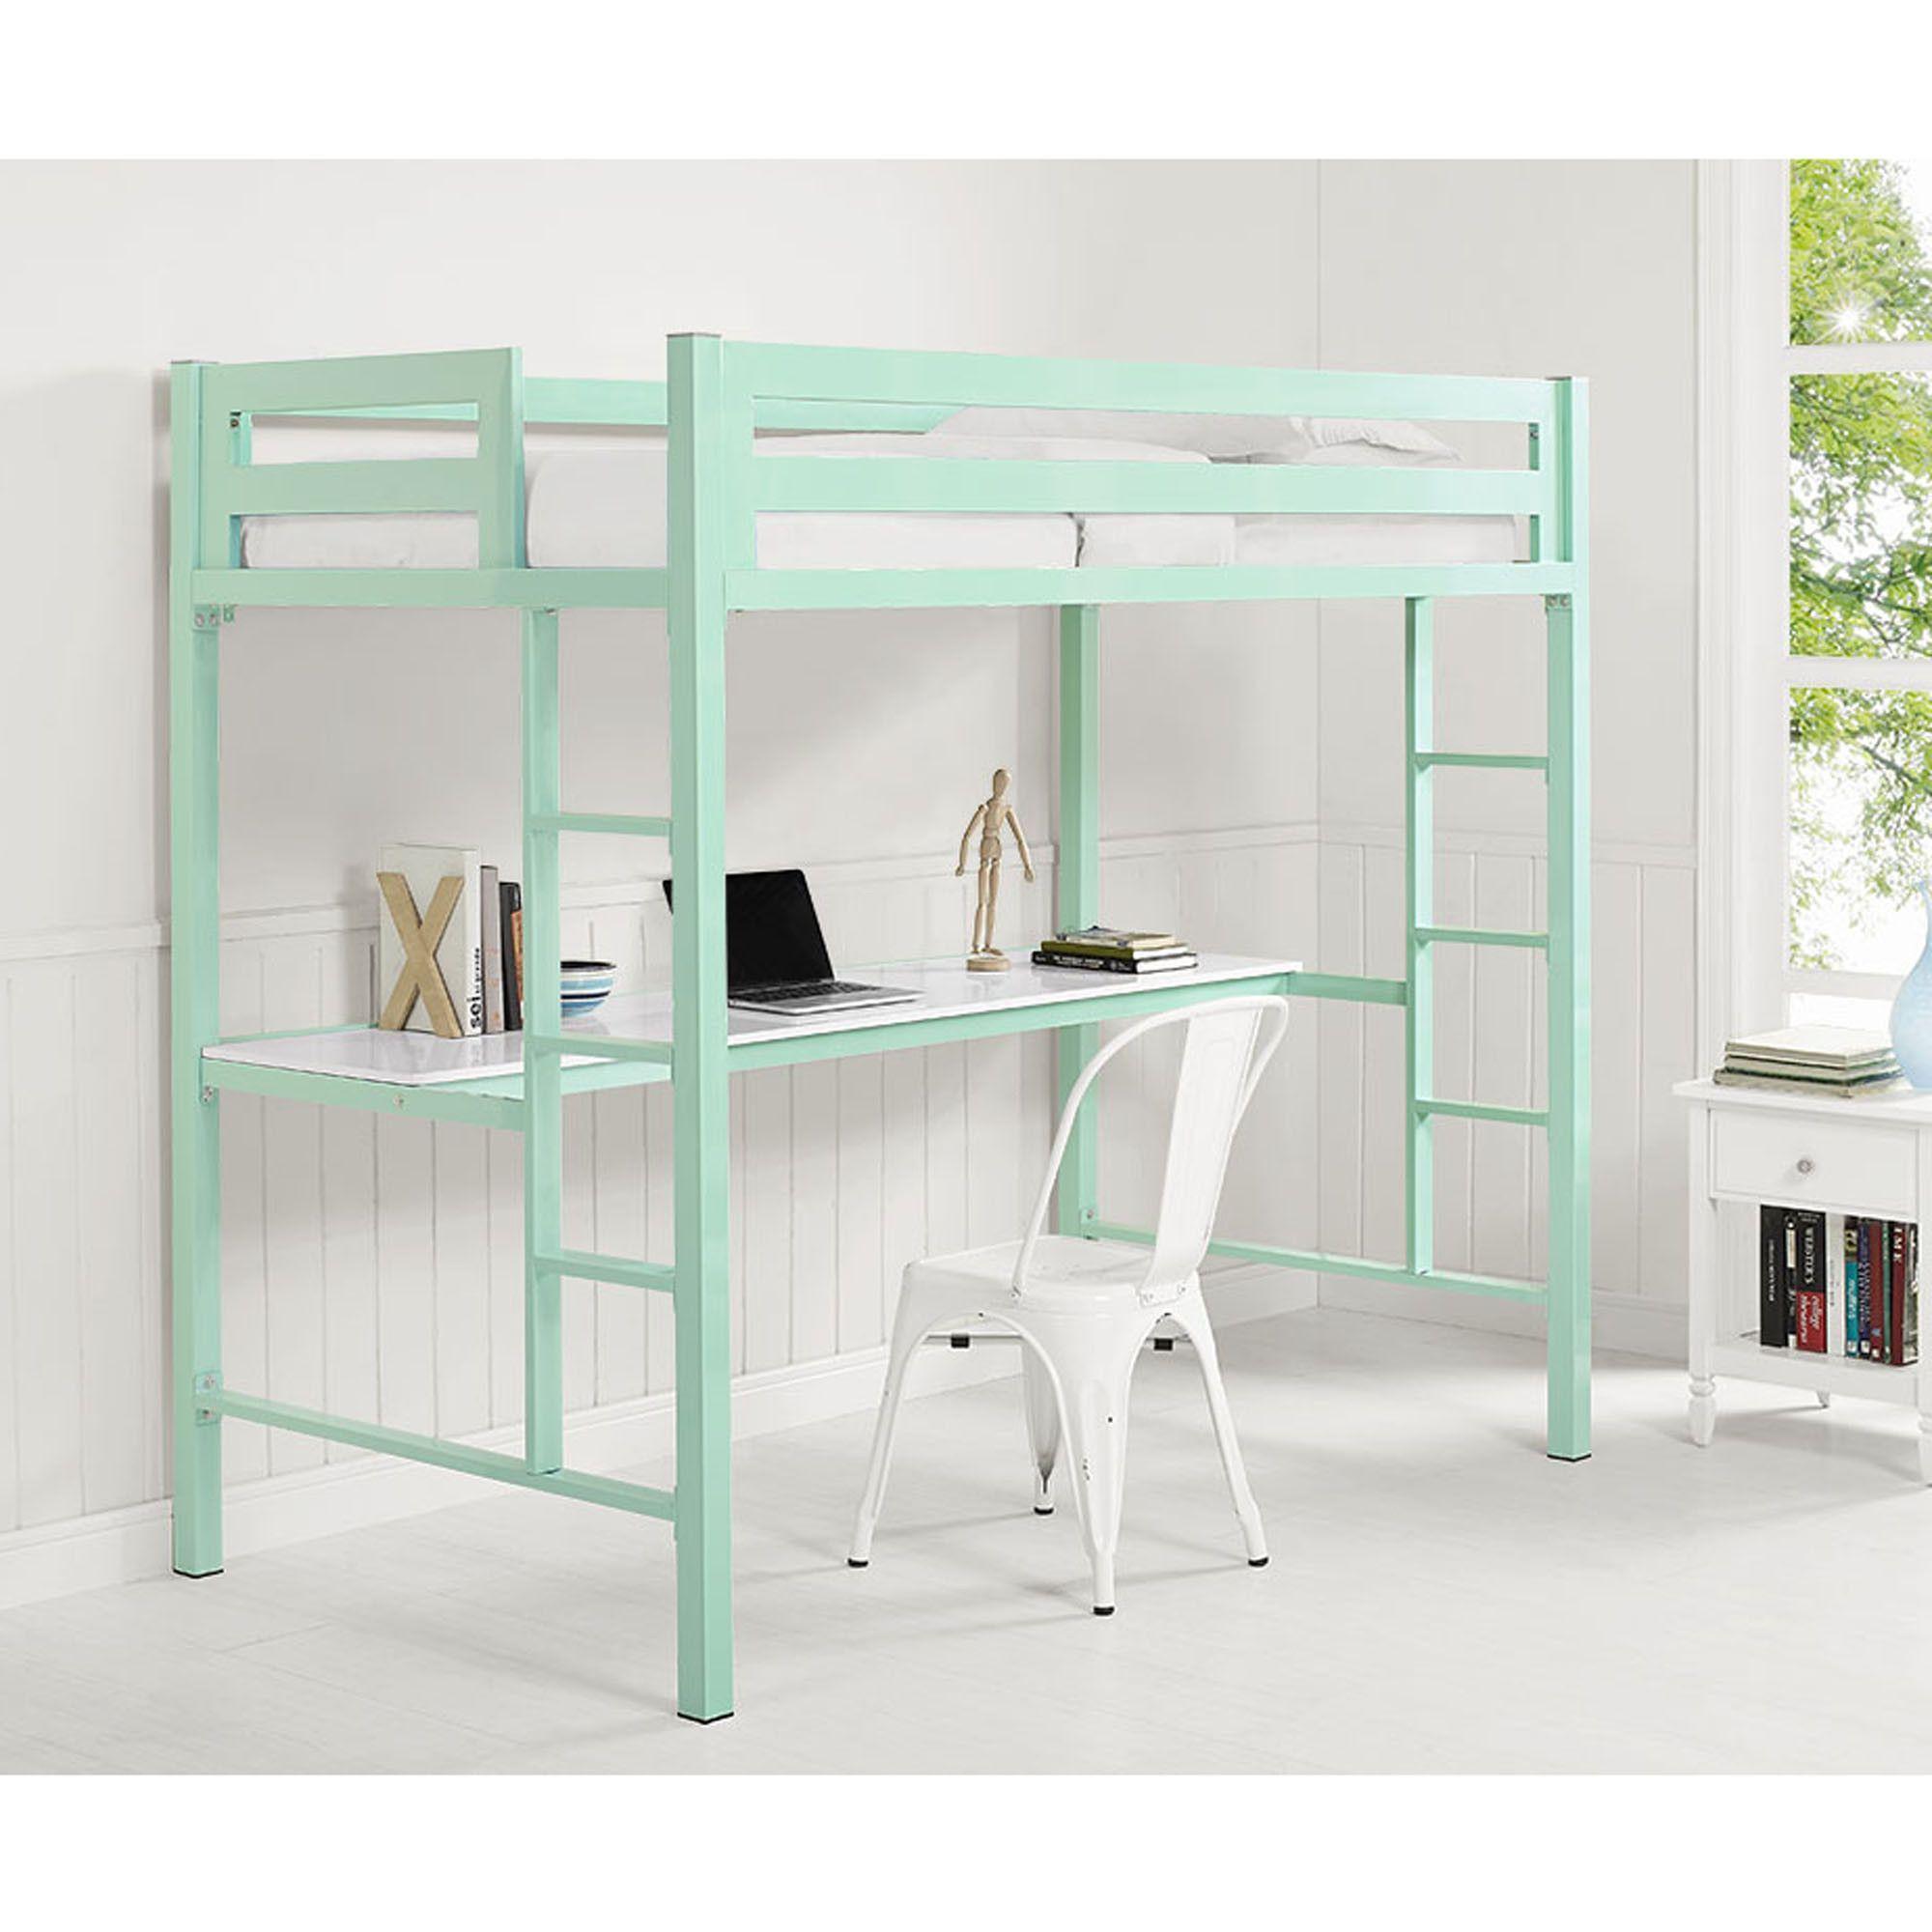 Bentley twin metal loft bed with workstation mint diy furniture